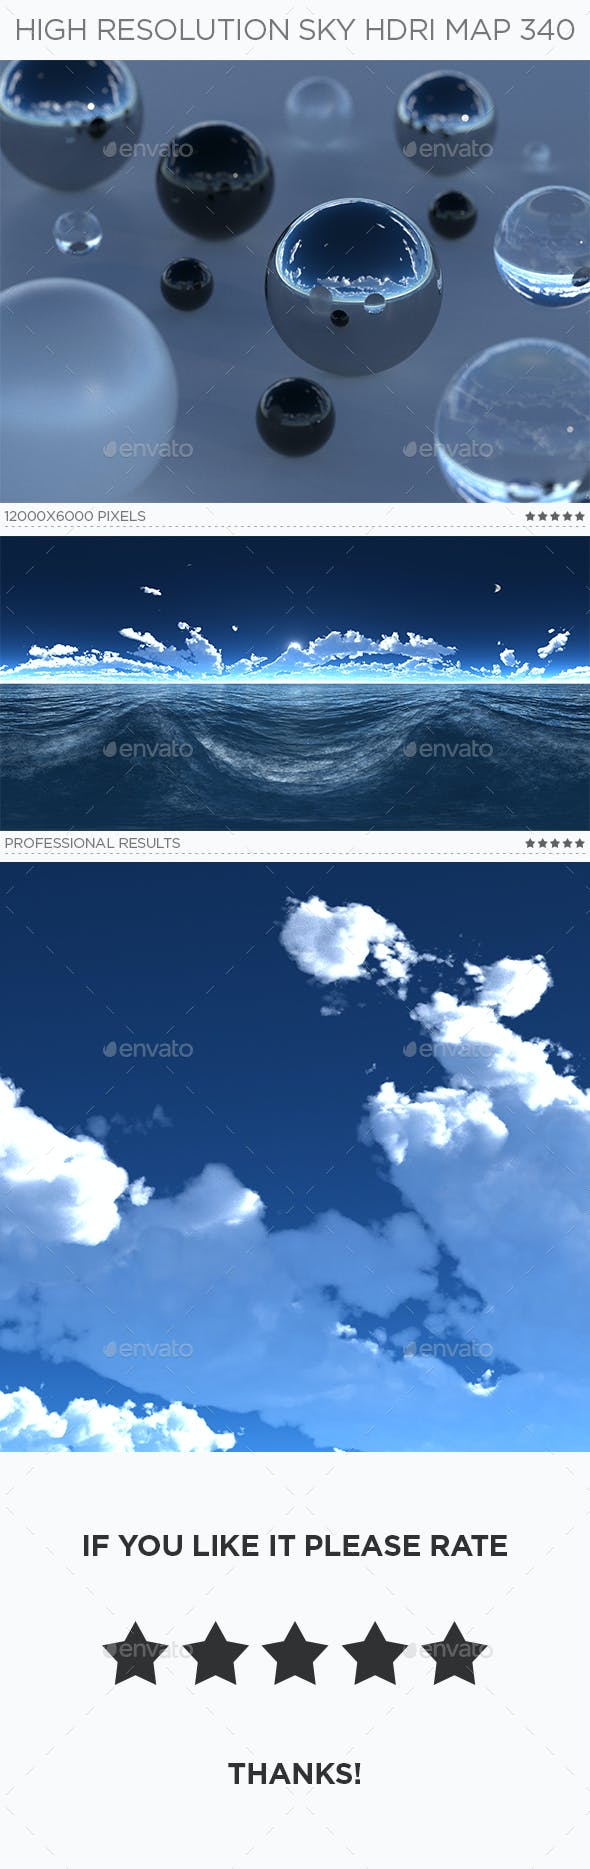 High Resolution Sky HDRi Map 340 - 3DOcean Item for Sale